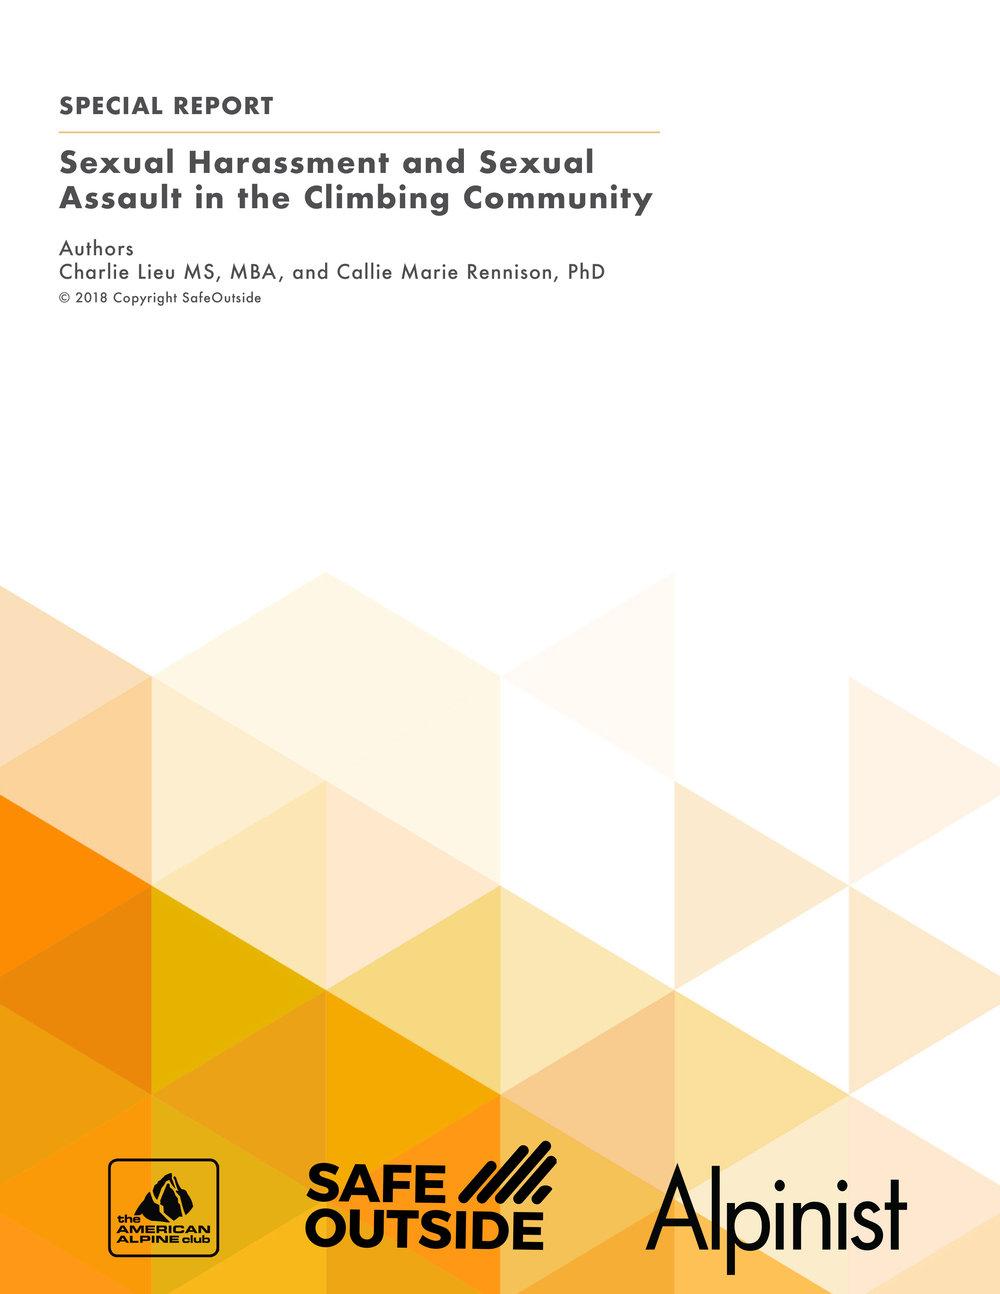 SHSA-Report-Cover.jpg